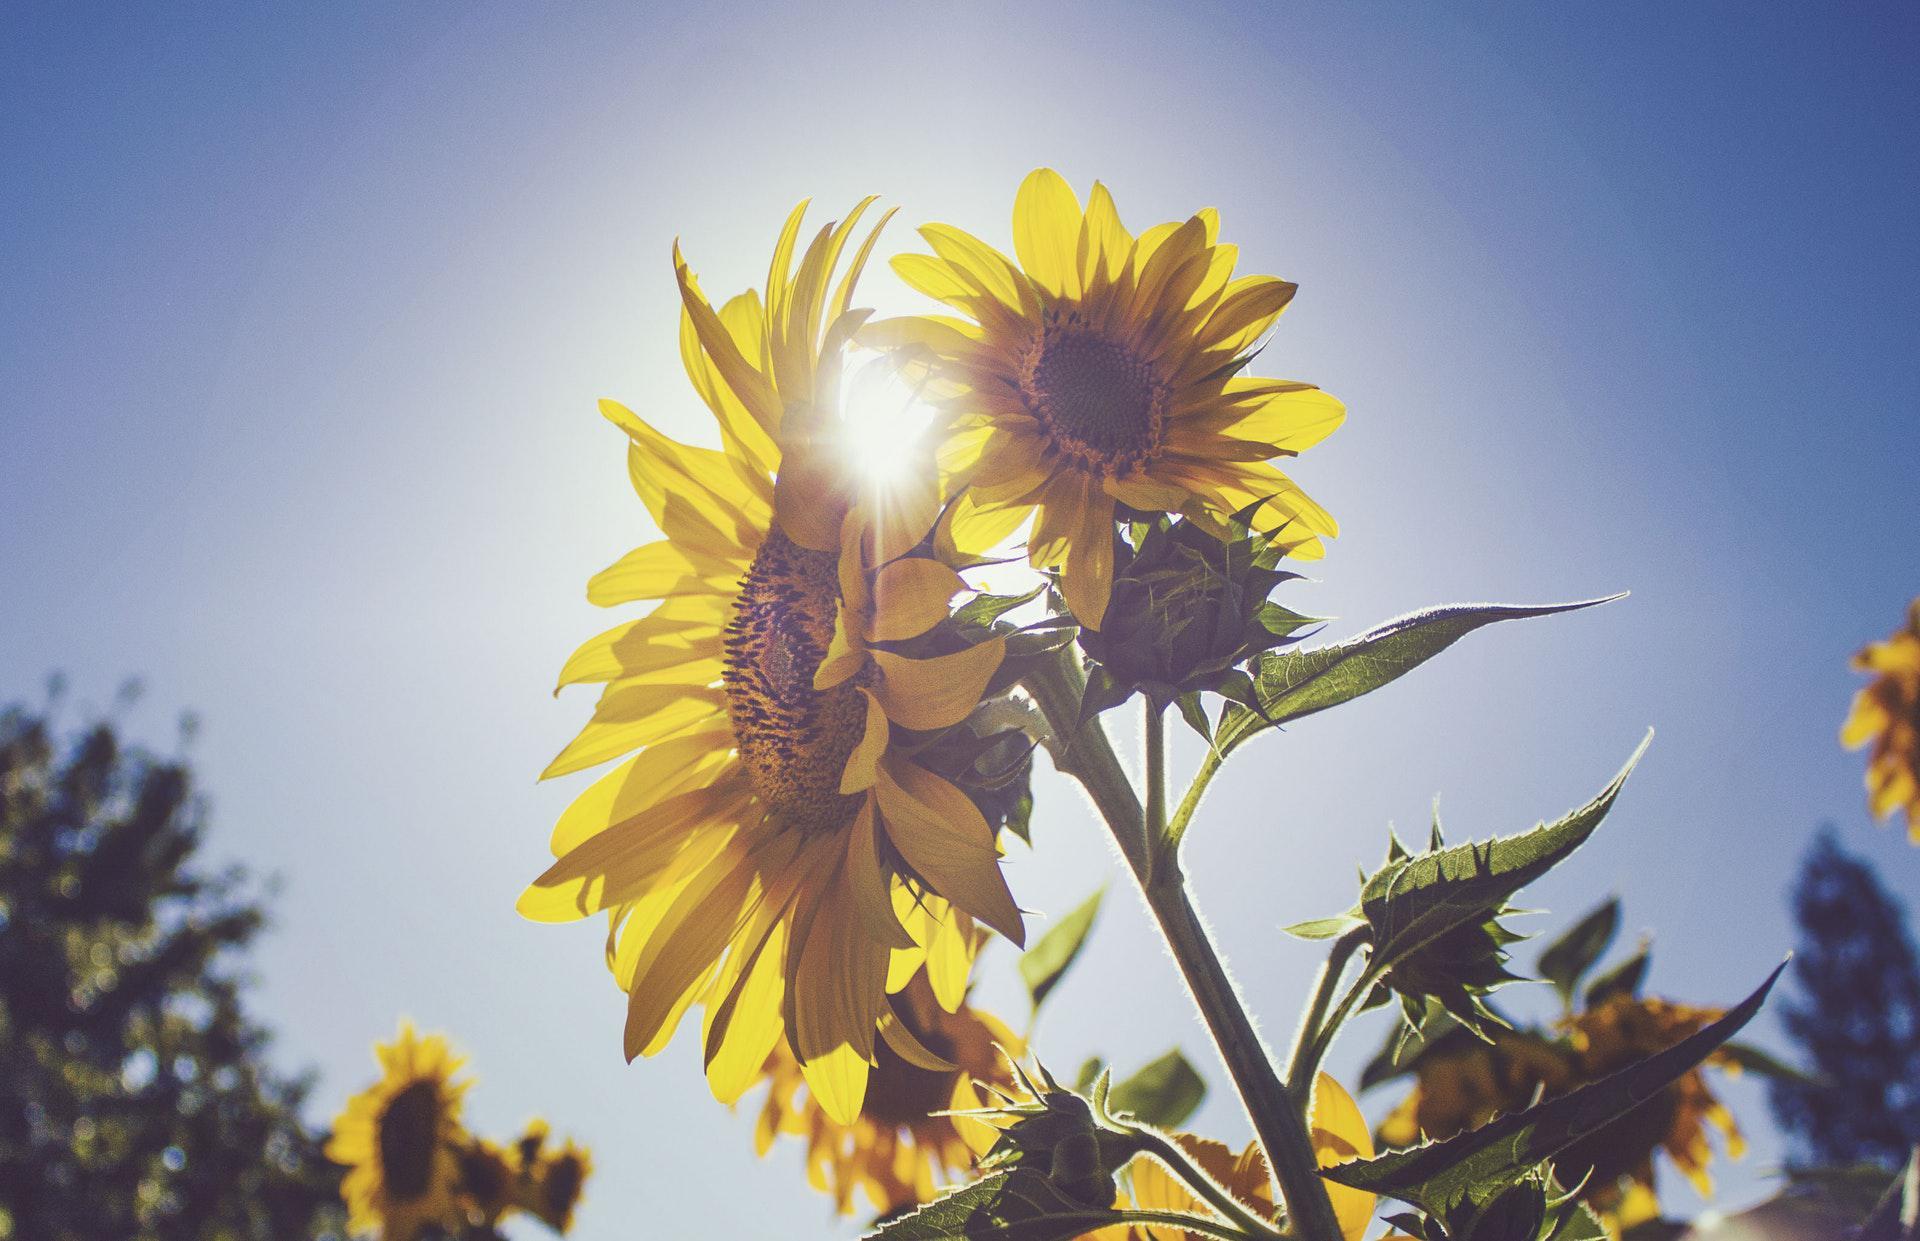 عکس زمینه گل آفتابگردان زیر آسمان آبی پس زمینه